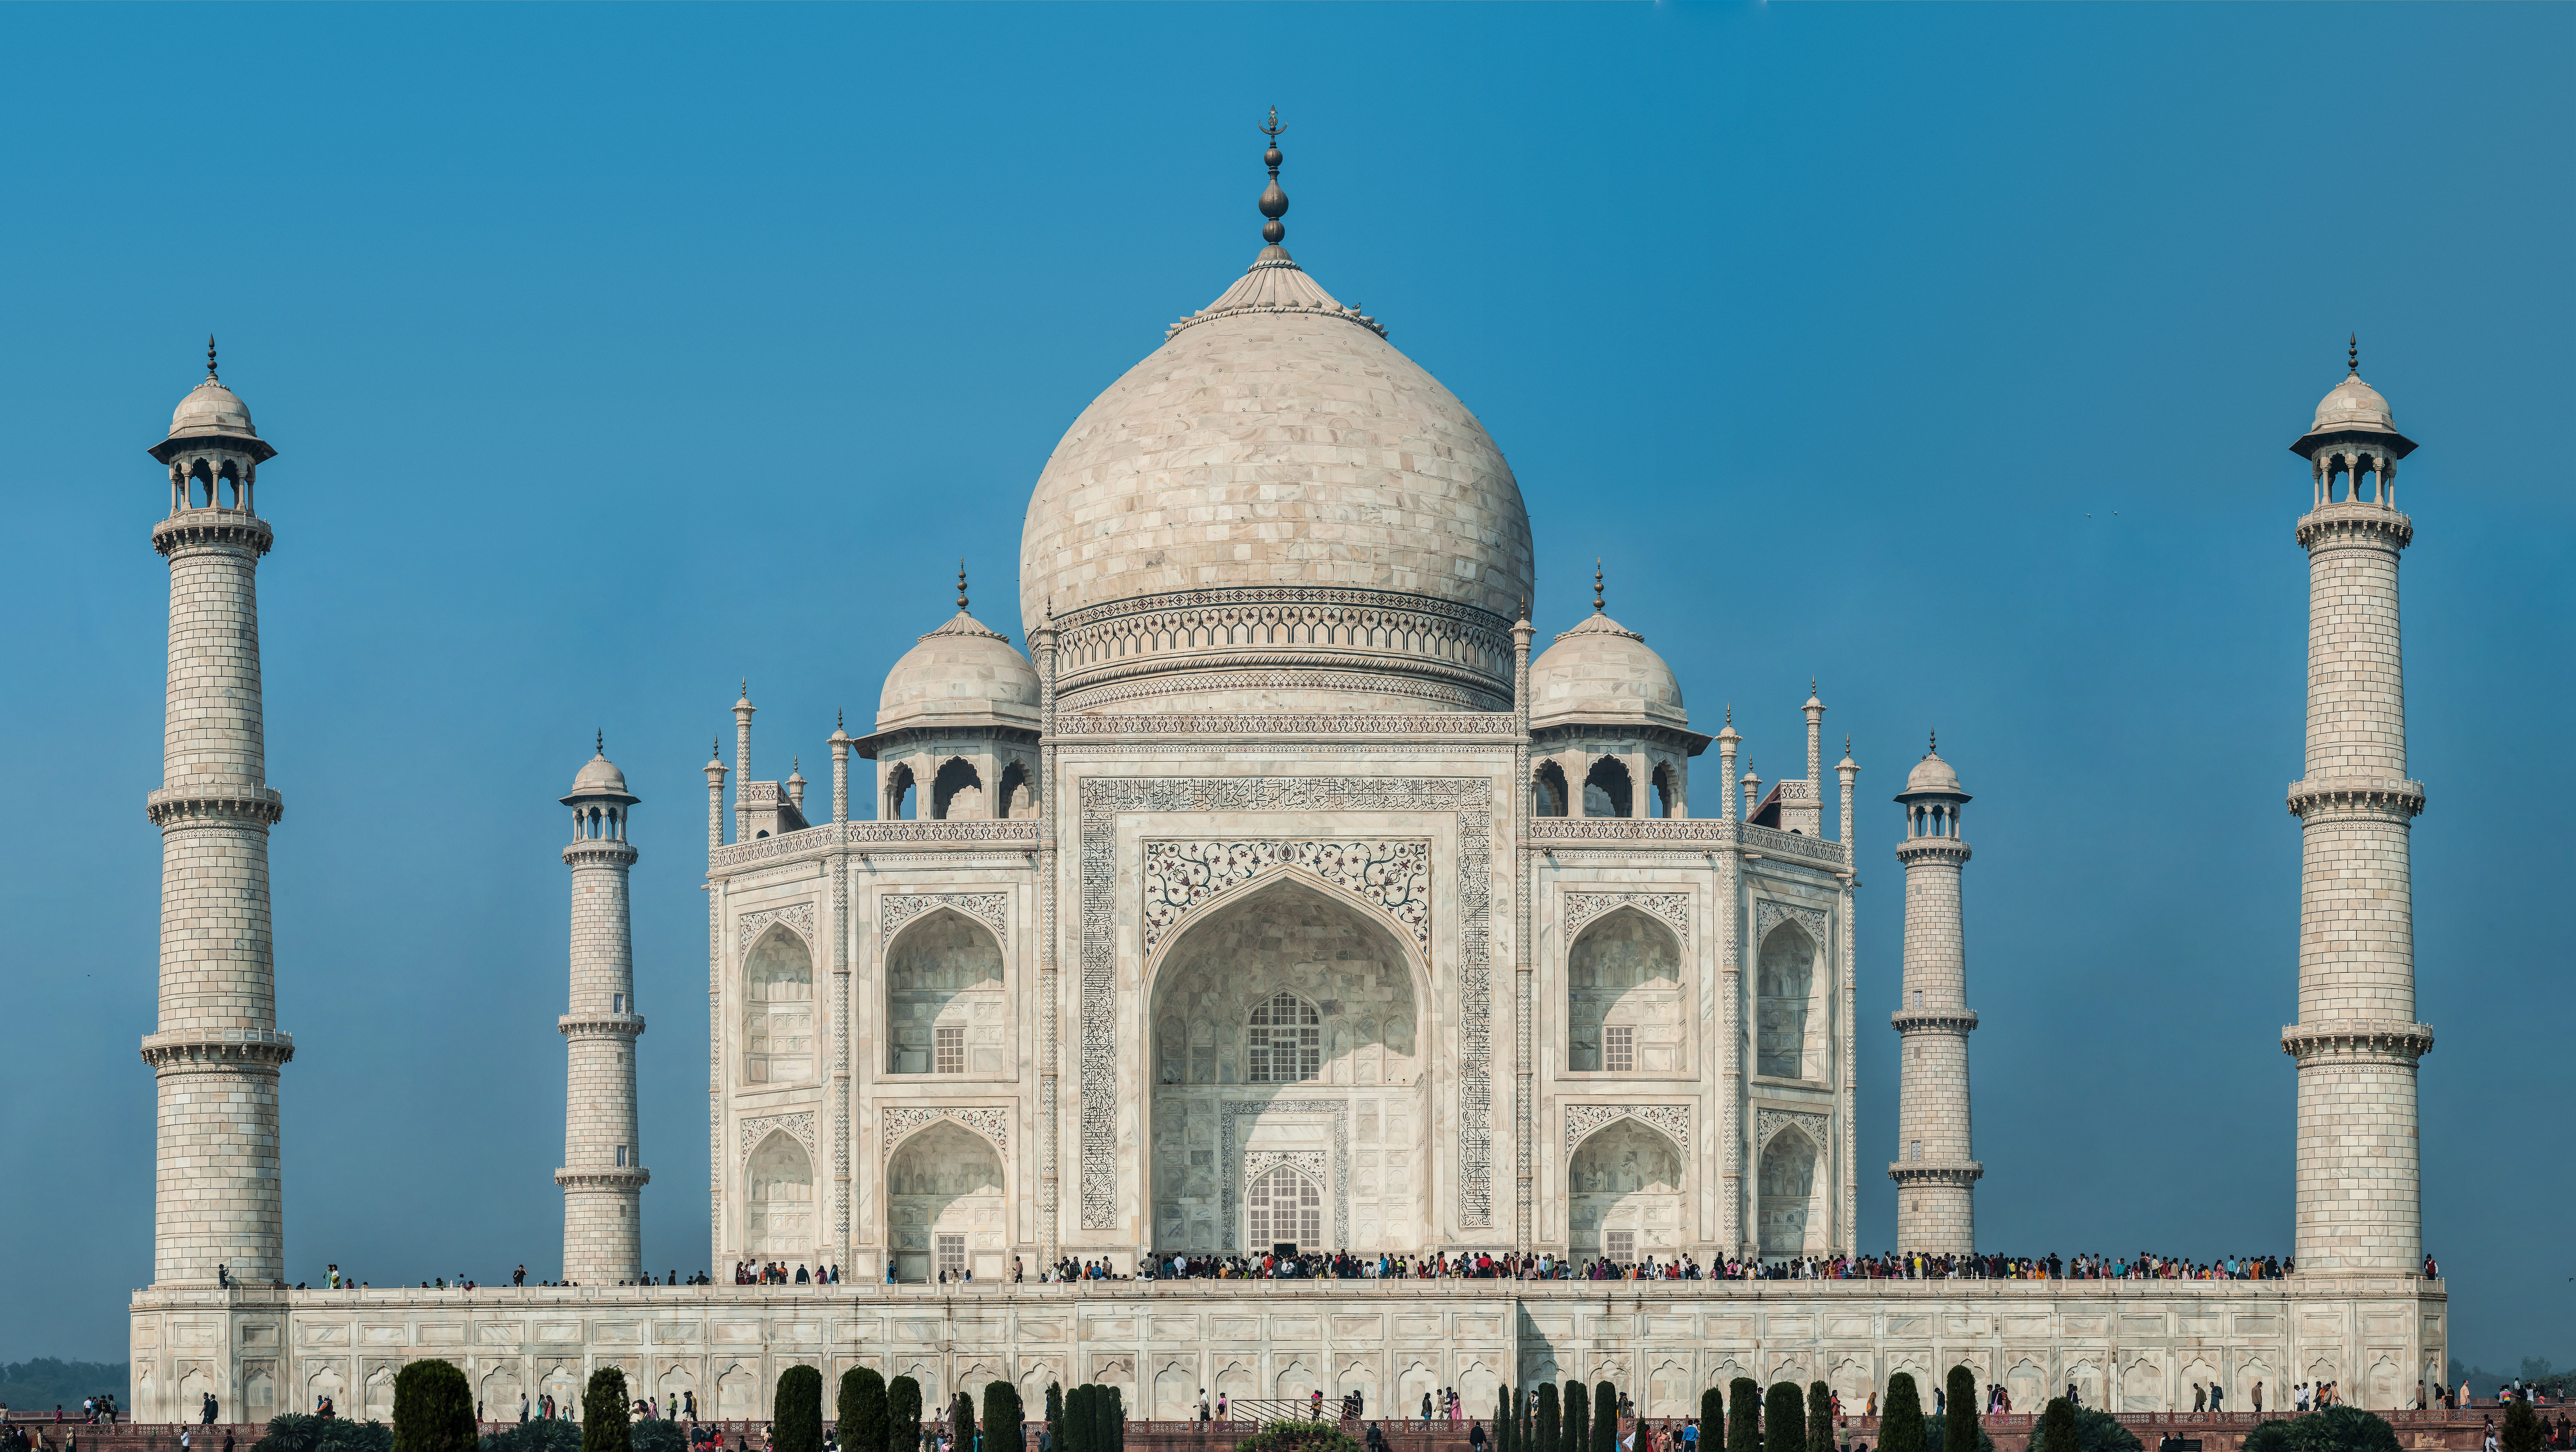 Taj Mahal N Up A28 A Jpg 11081 6247 Taj Mahal Mundo Antigo